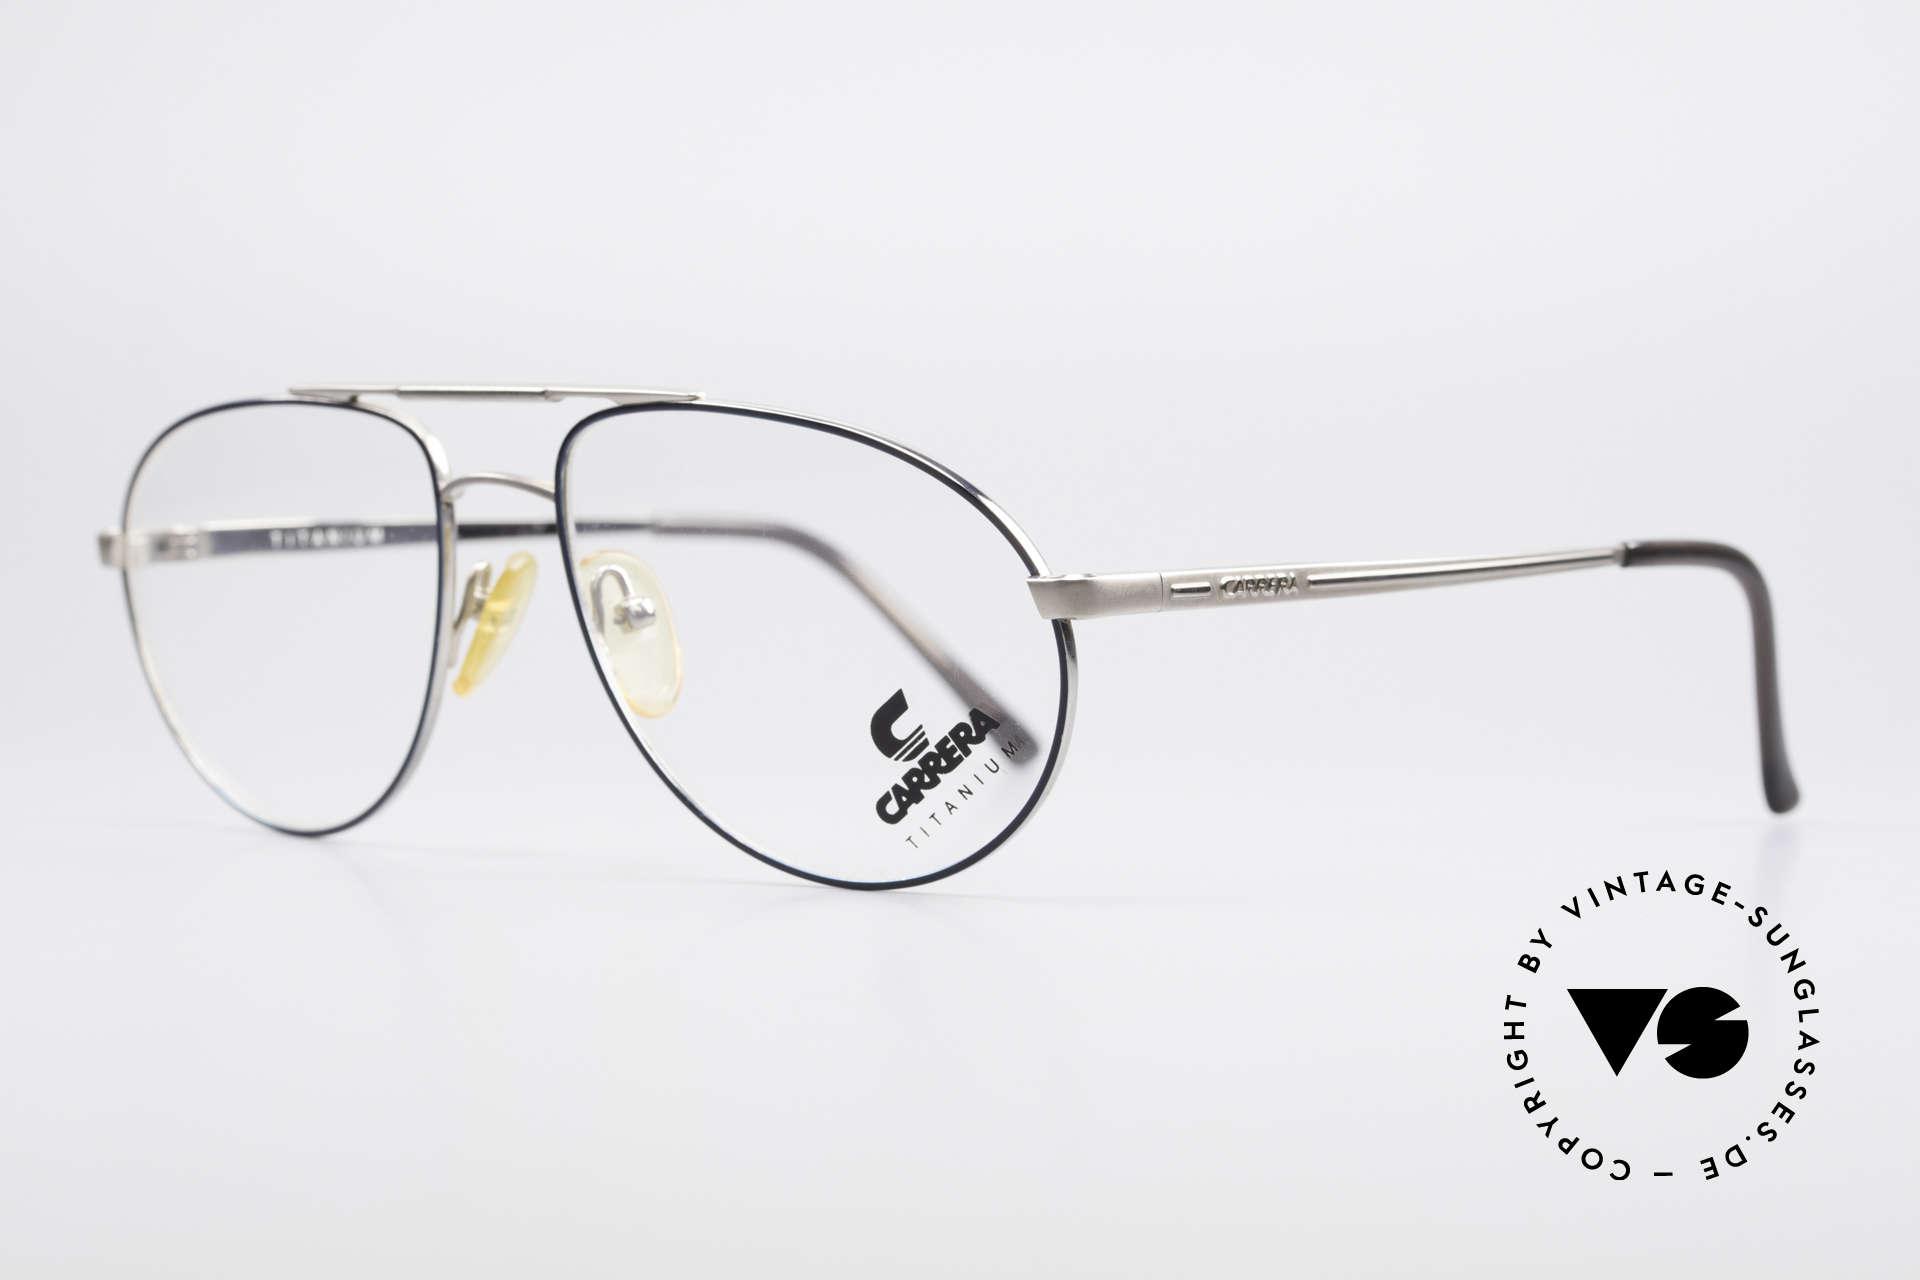 Carrera 5798 Titanium Vintage Eyeglasses, premium craftsmanship and very pleasantly to wear, Made for Men